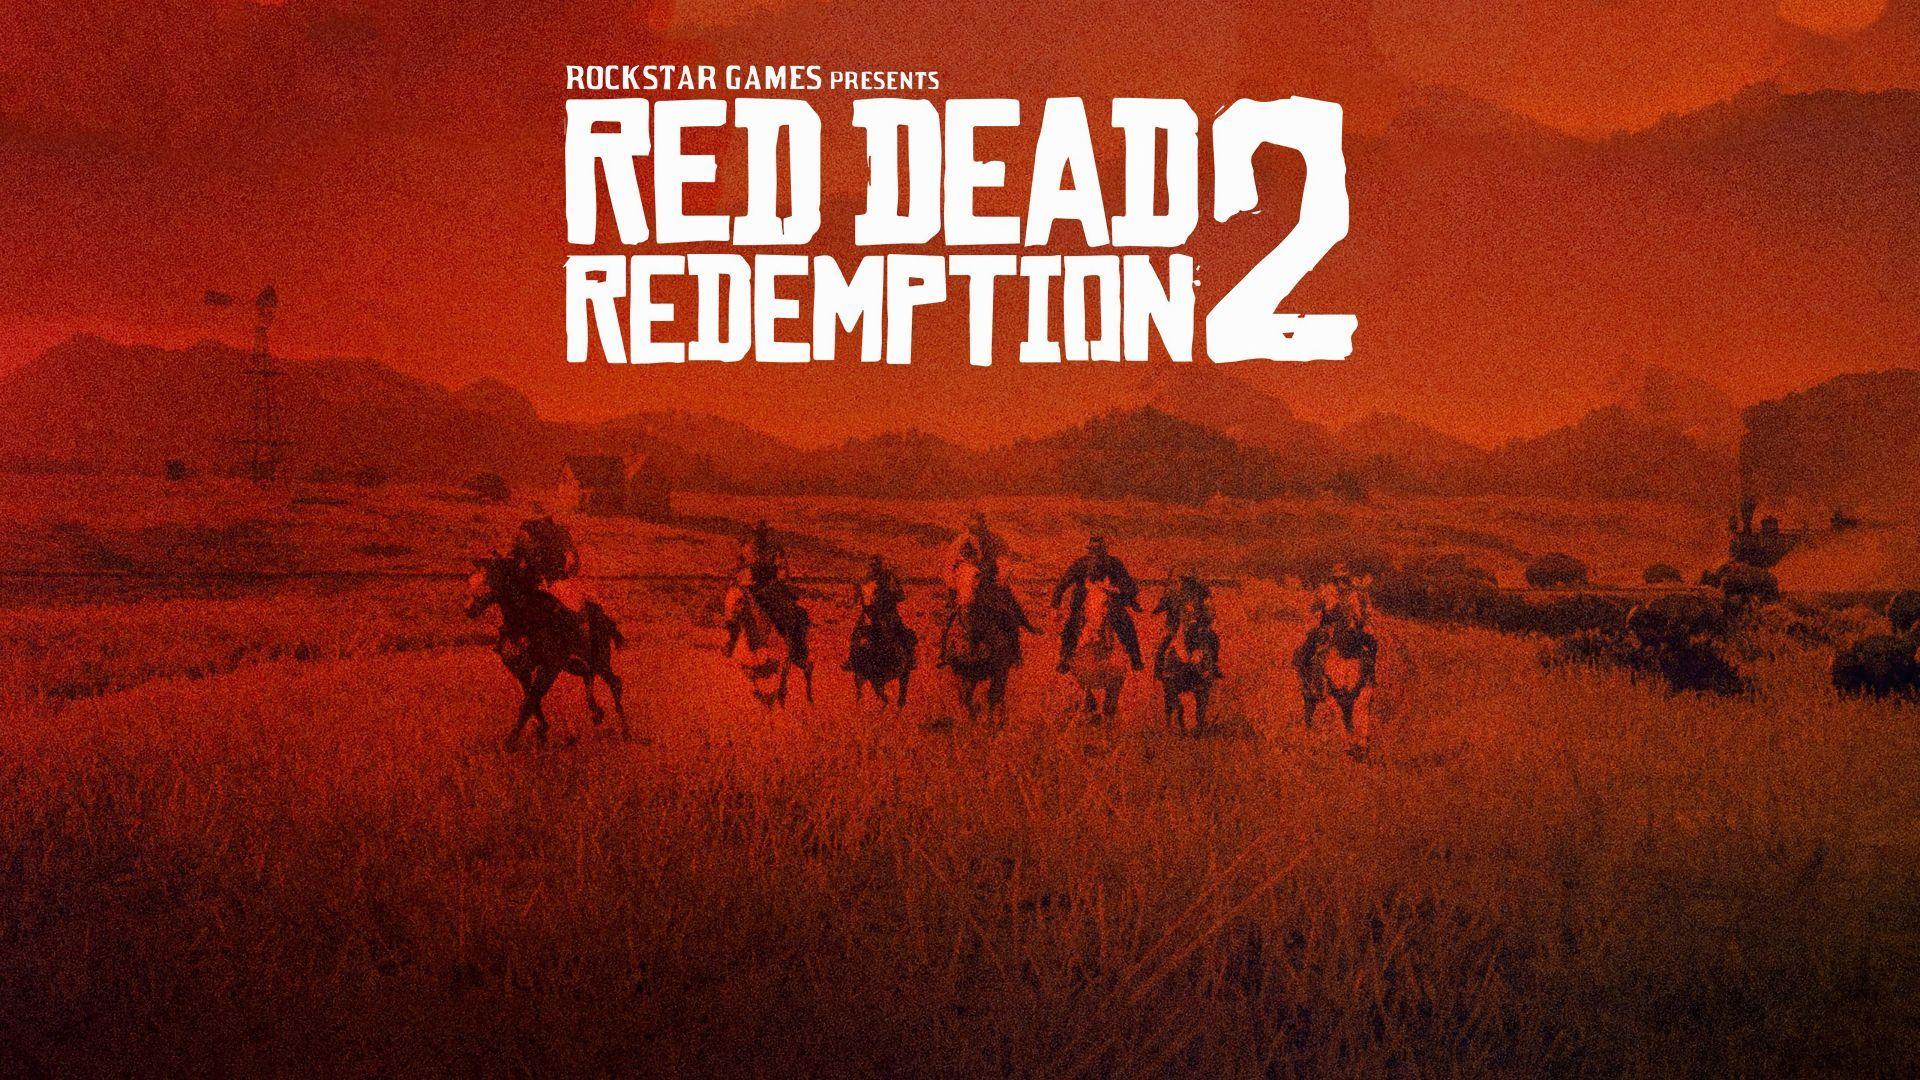 Wallpaper Red Dead Redemption 2 Poster 4k Games 18211 Red Dead Redemption Red Dead Redemption Ii Red Dead Redemption Game